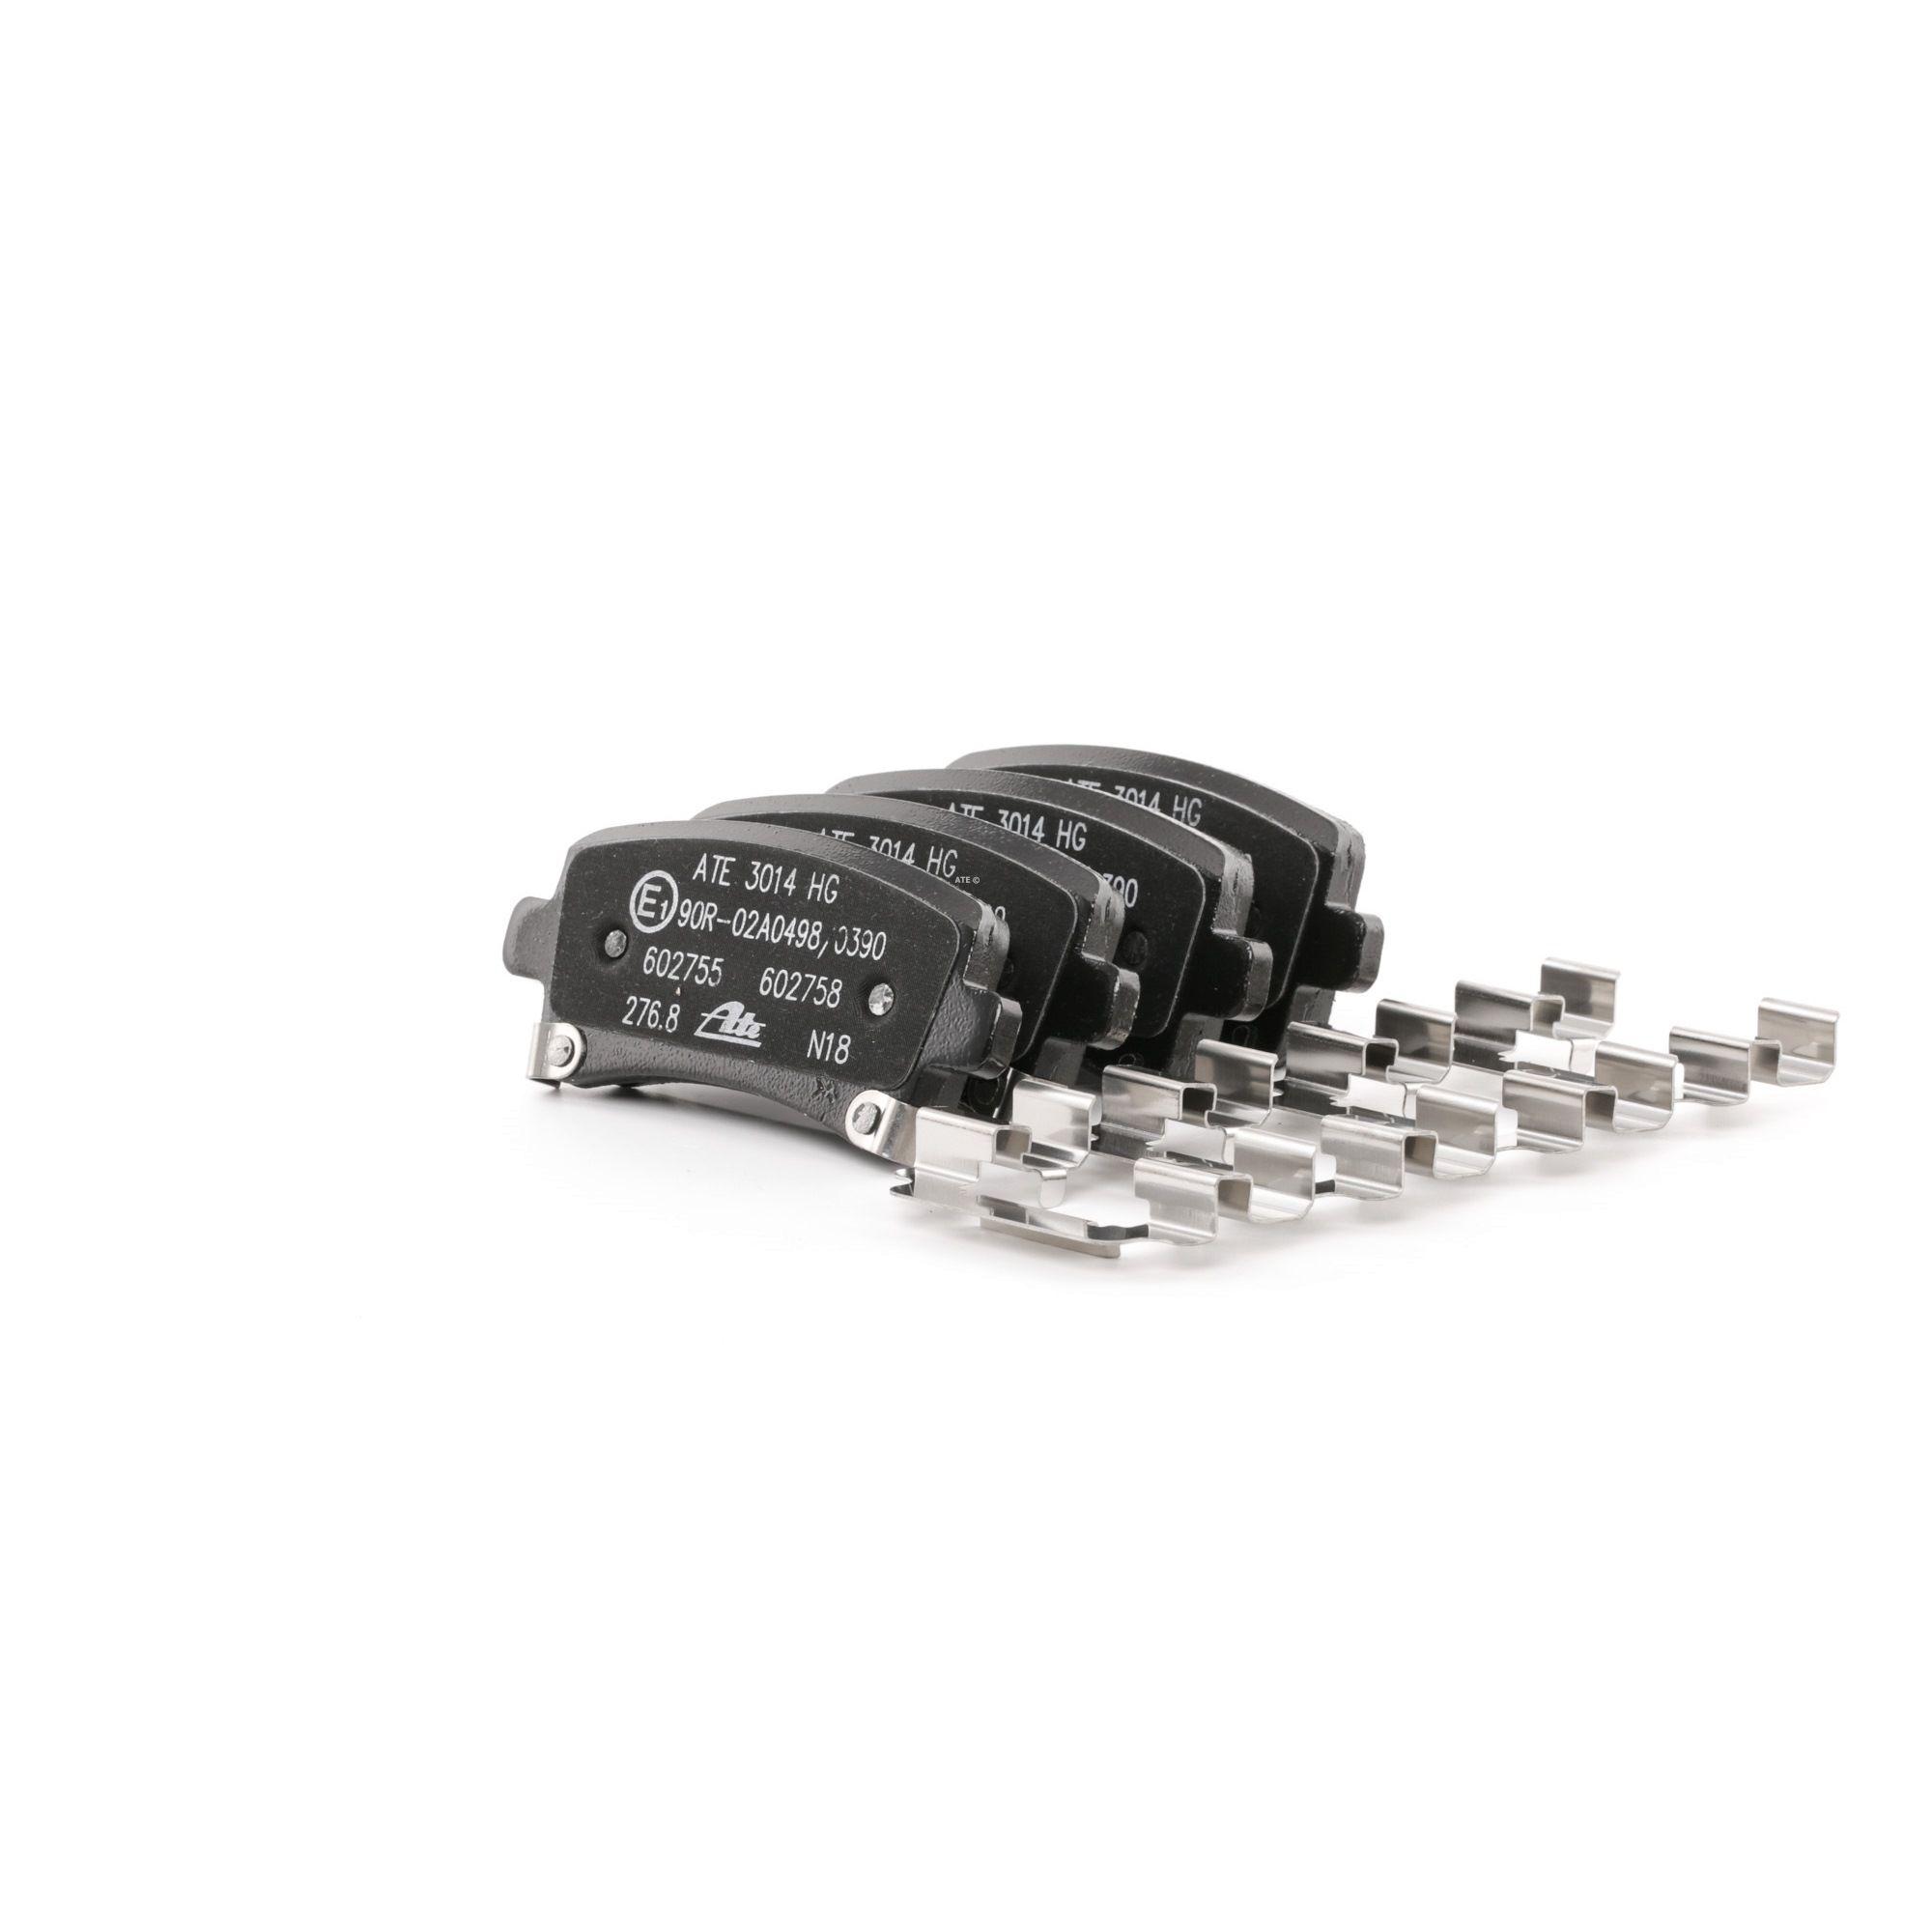 ATE: Original Bremsbeläge 13.0460-2755.2 (Höhe: 47,1mm, Breite: 106,3mm, Dicke/Stärke: 17,2mm)